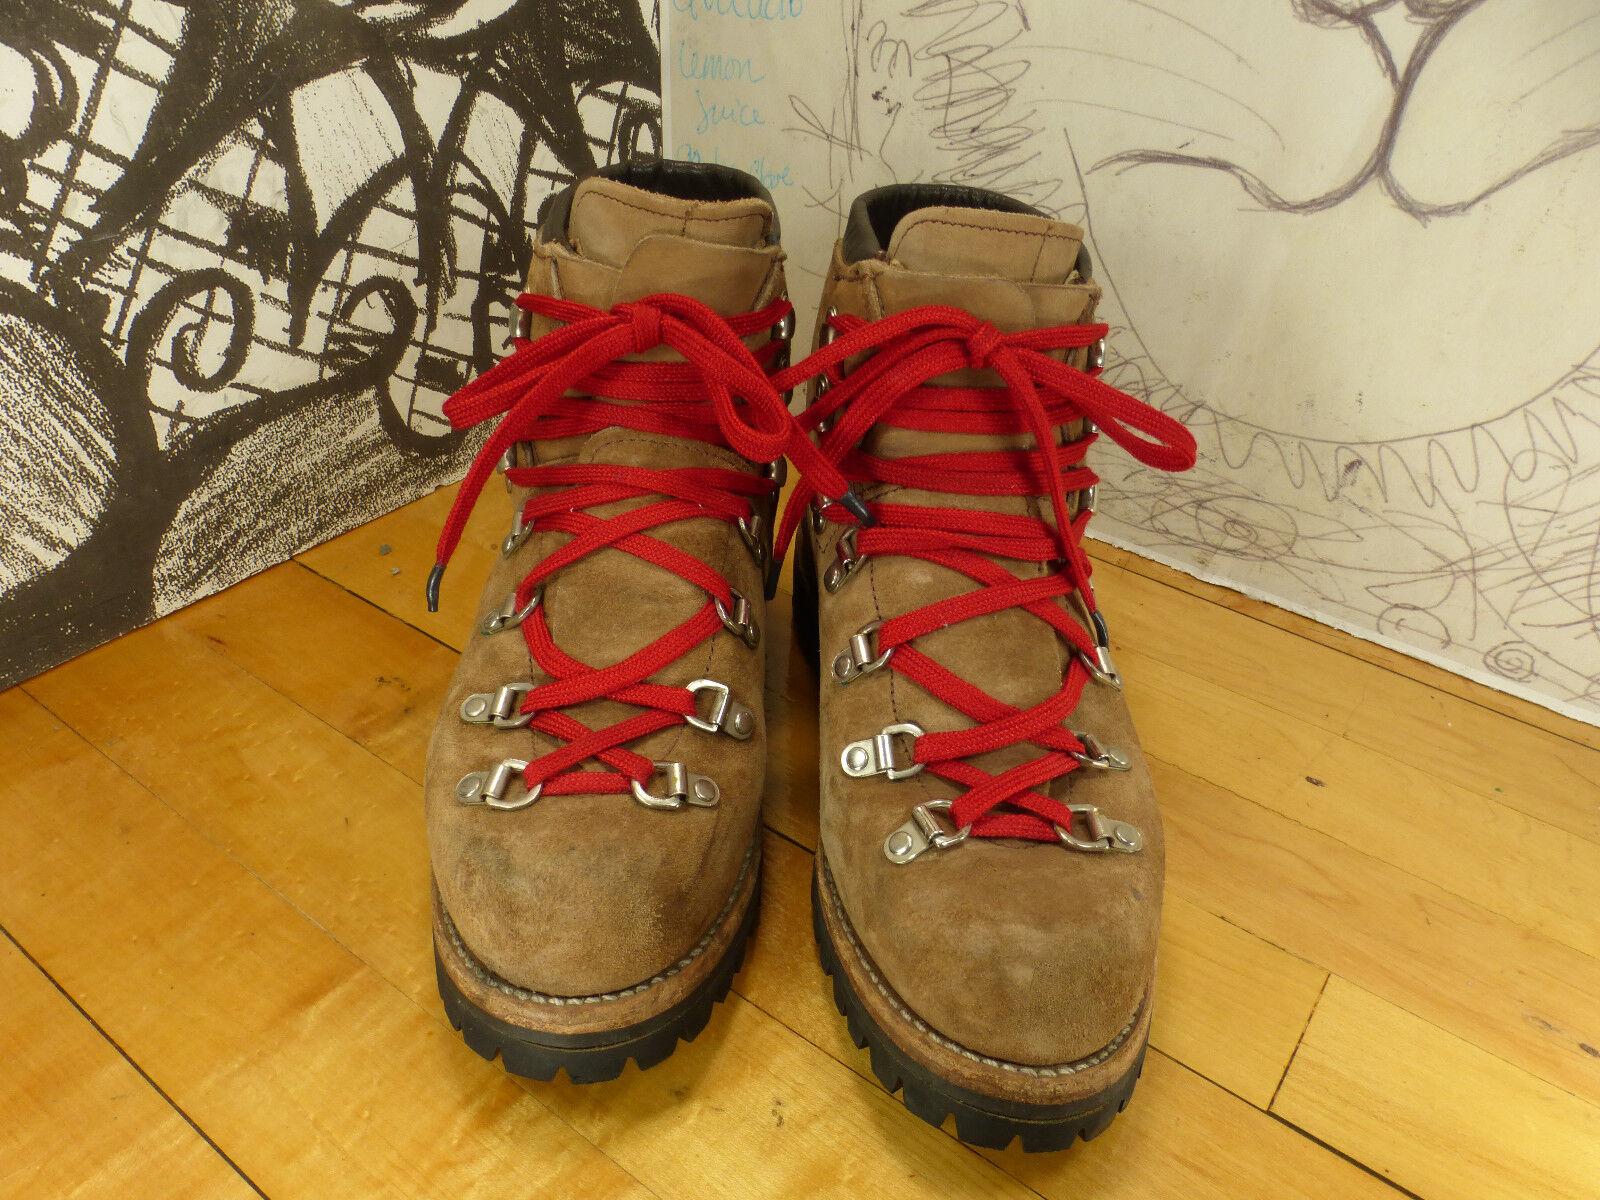 Vasque Mountaineering, Hiking Boots 8C, 14424